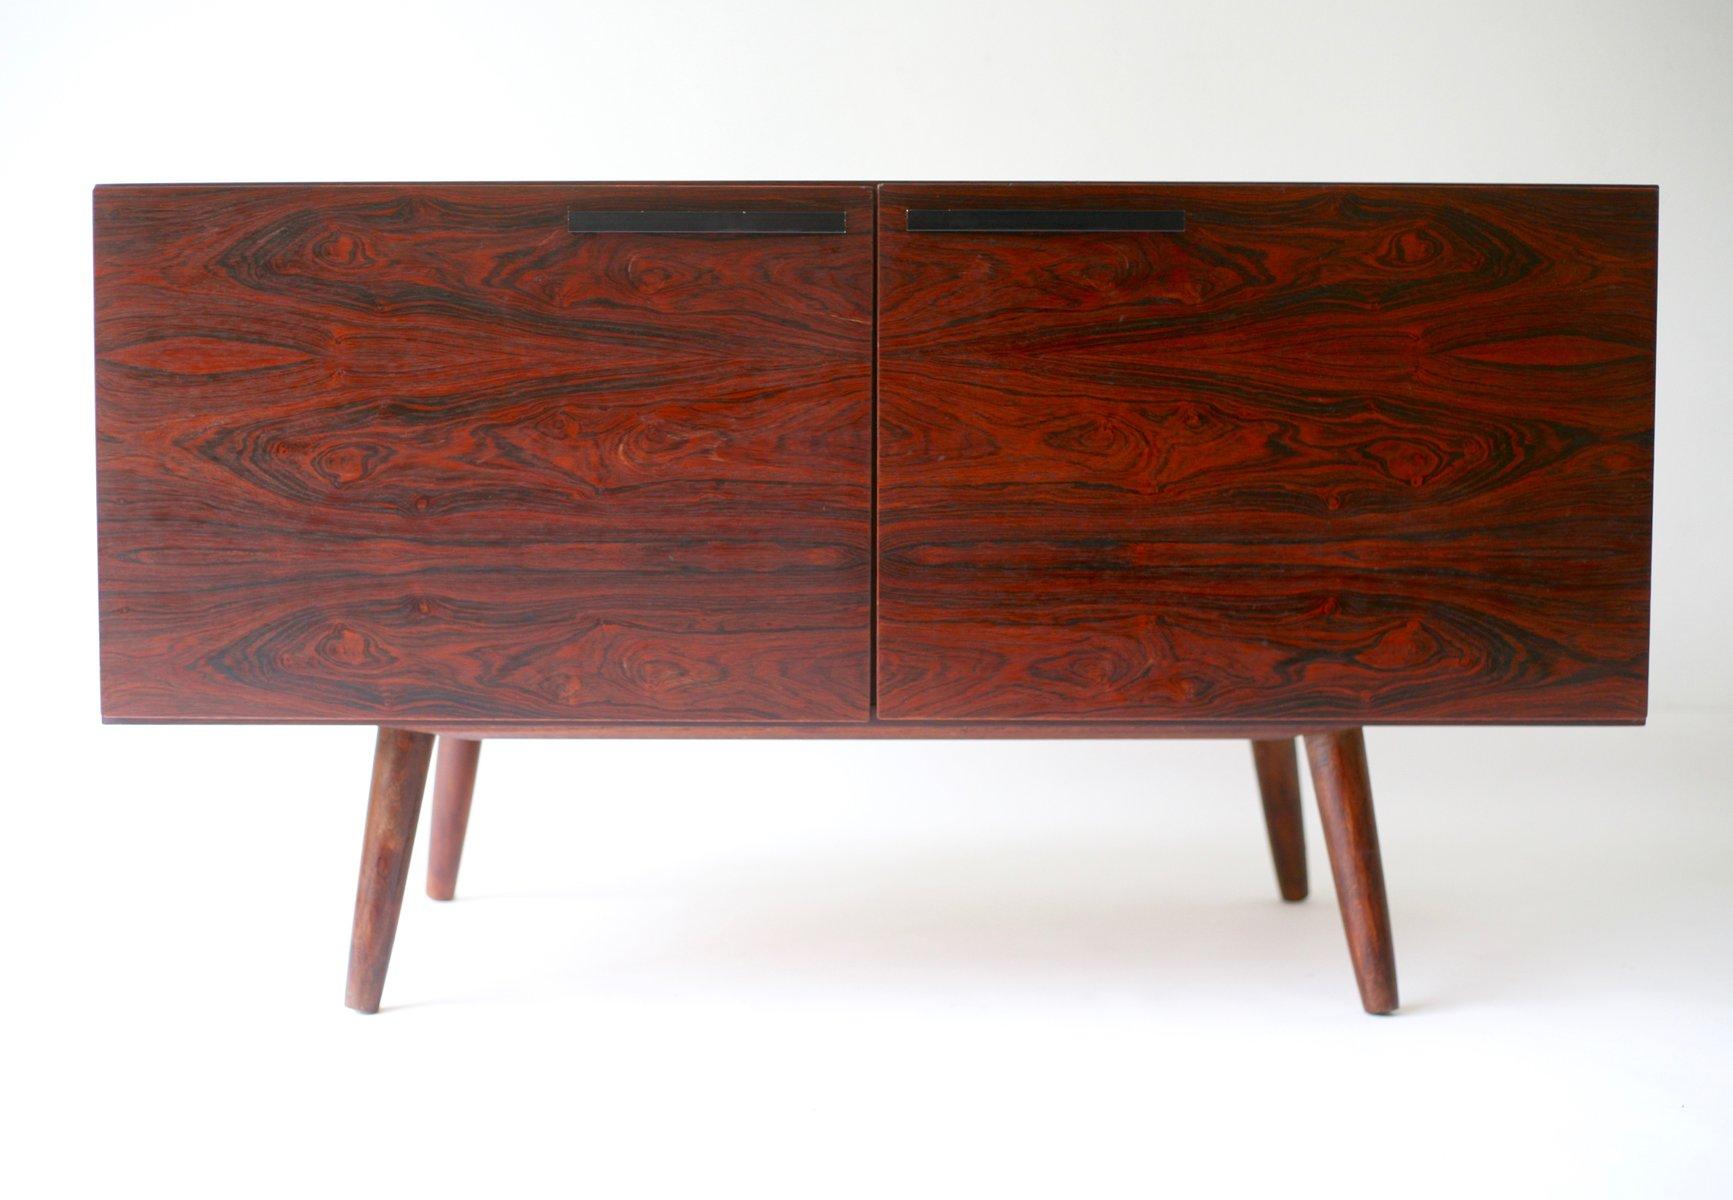 Vintage Jacaranda Sideboard By Ib Kofod Larsen For Faarup Furniture